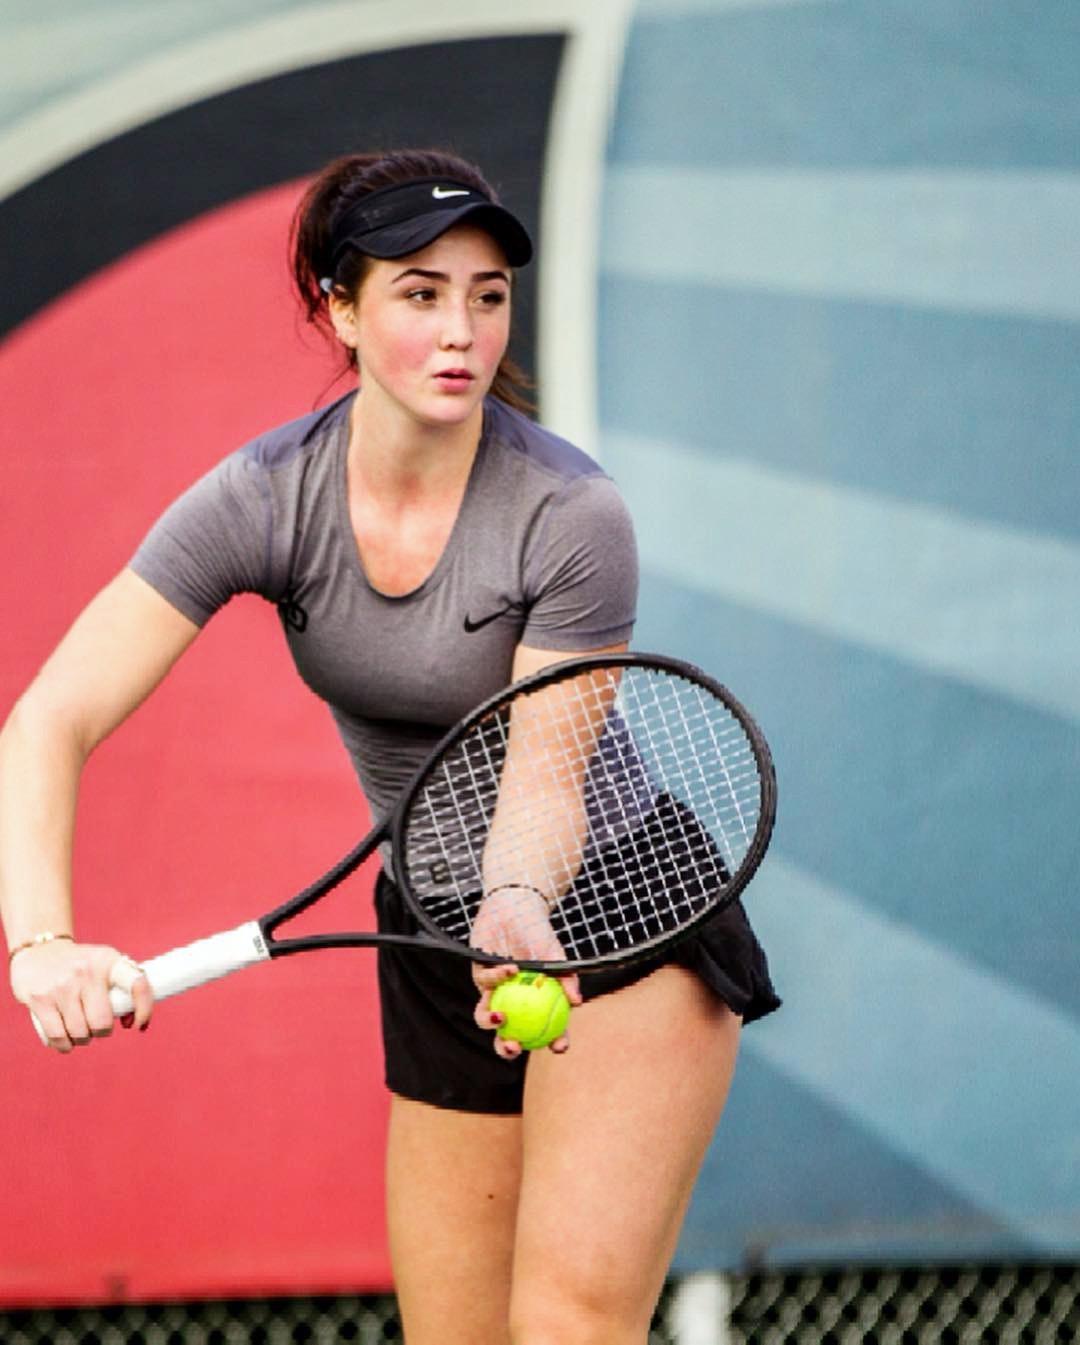 Jacqueline W. teaches tennis lessons in Azusa, CA